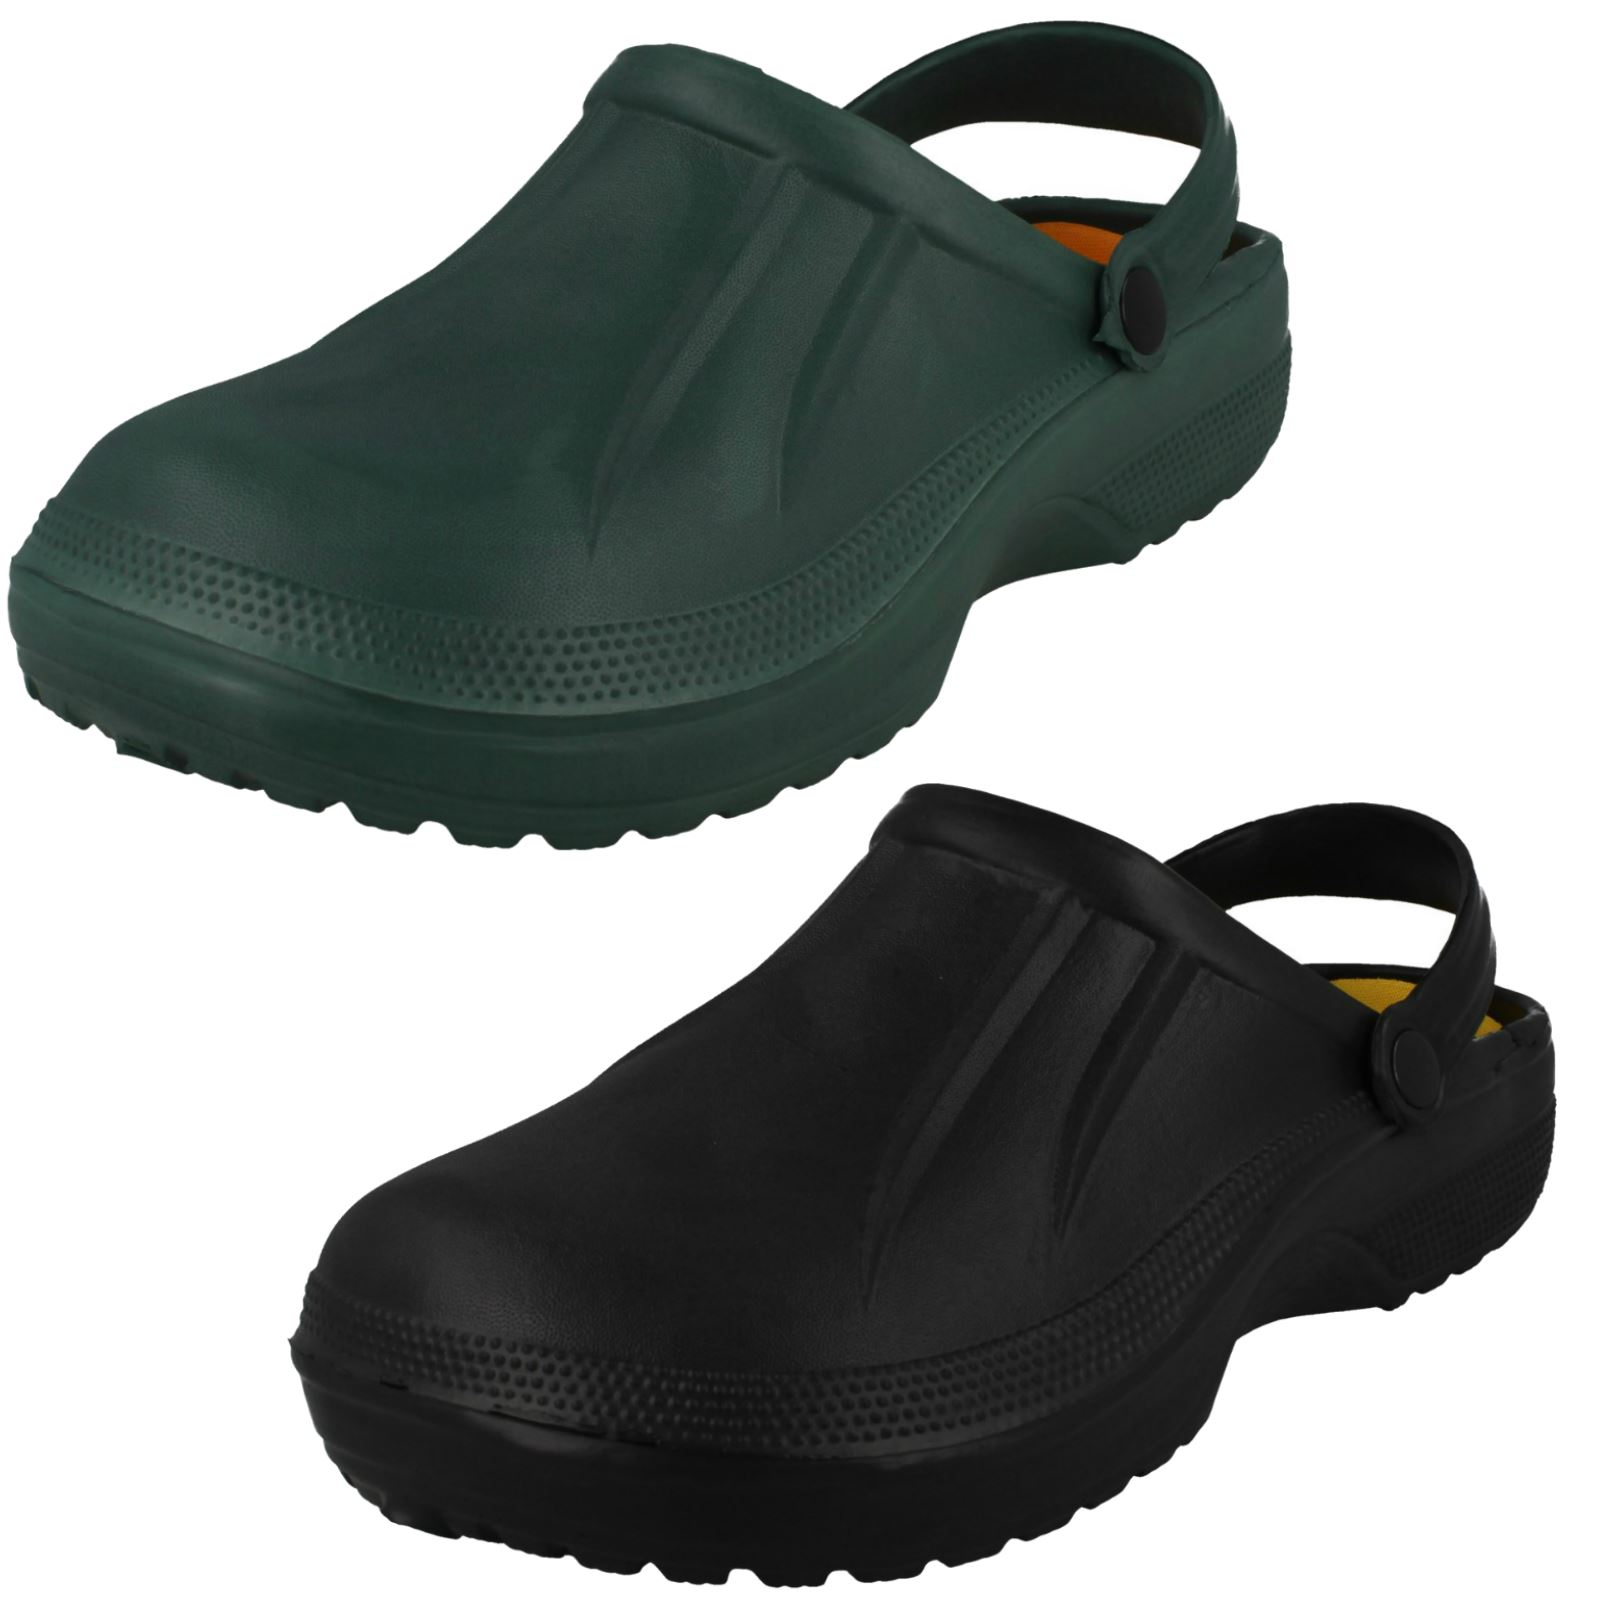 Garden Shoes Mens Casual Sandals